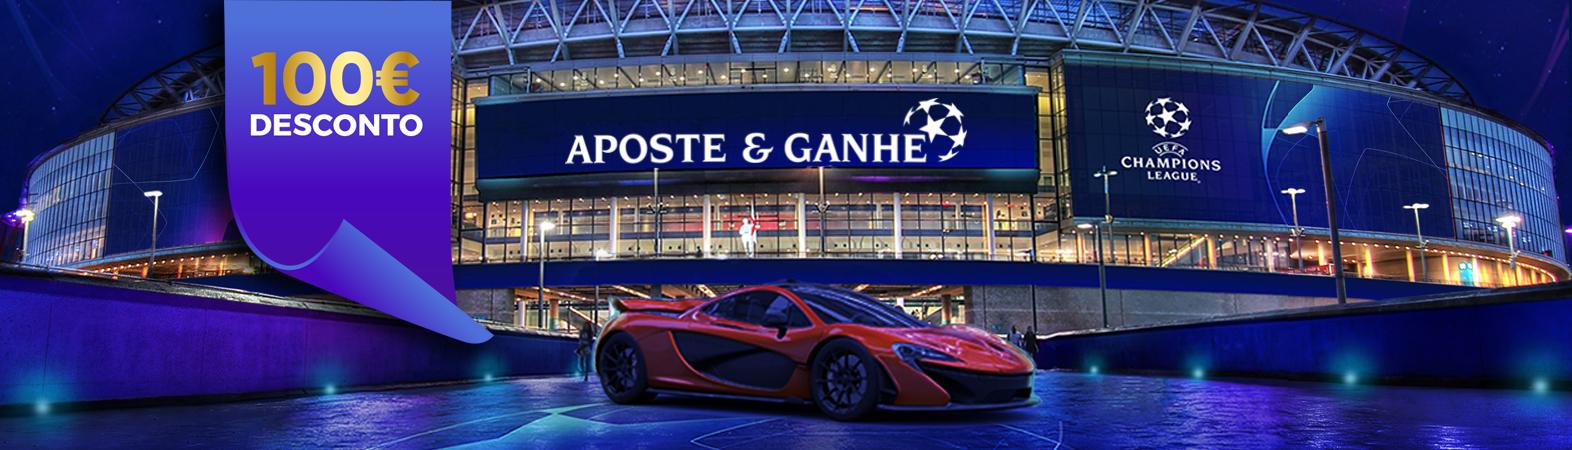 Aposte & Ganhe! - UEFA Champions League